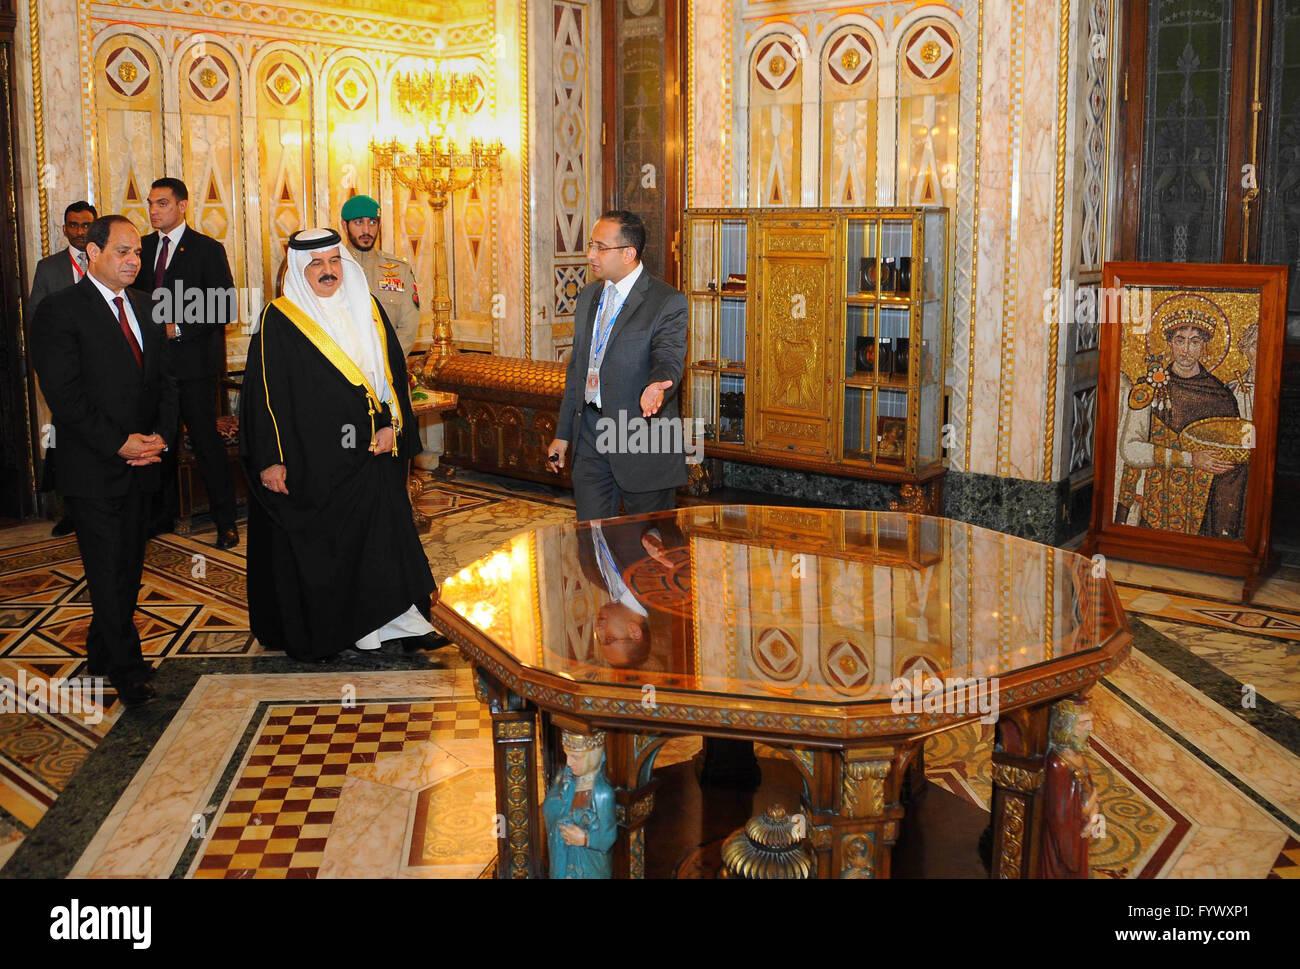 Cairo Egypt 27th Apr 2016 Egyptian President Abdel Fattah Al Sisi With Bahrains King Hamad Bin Issa Khalifa Visit The Abdeen Palace In